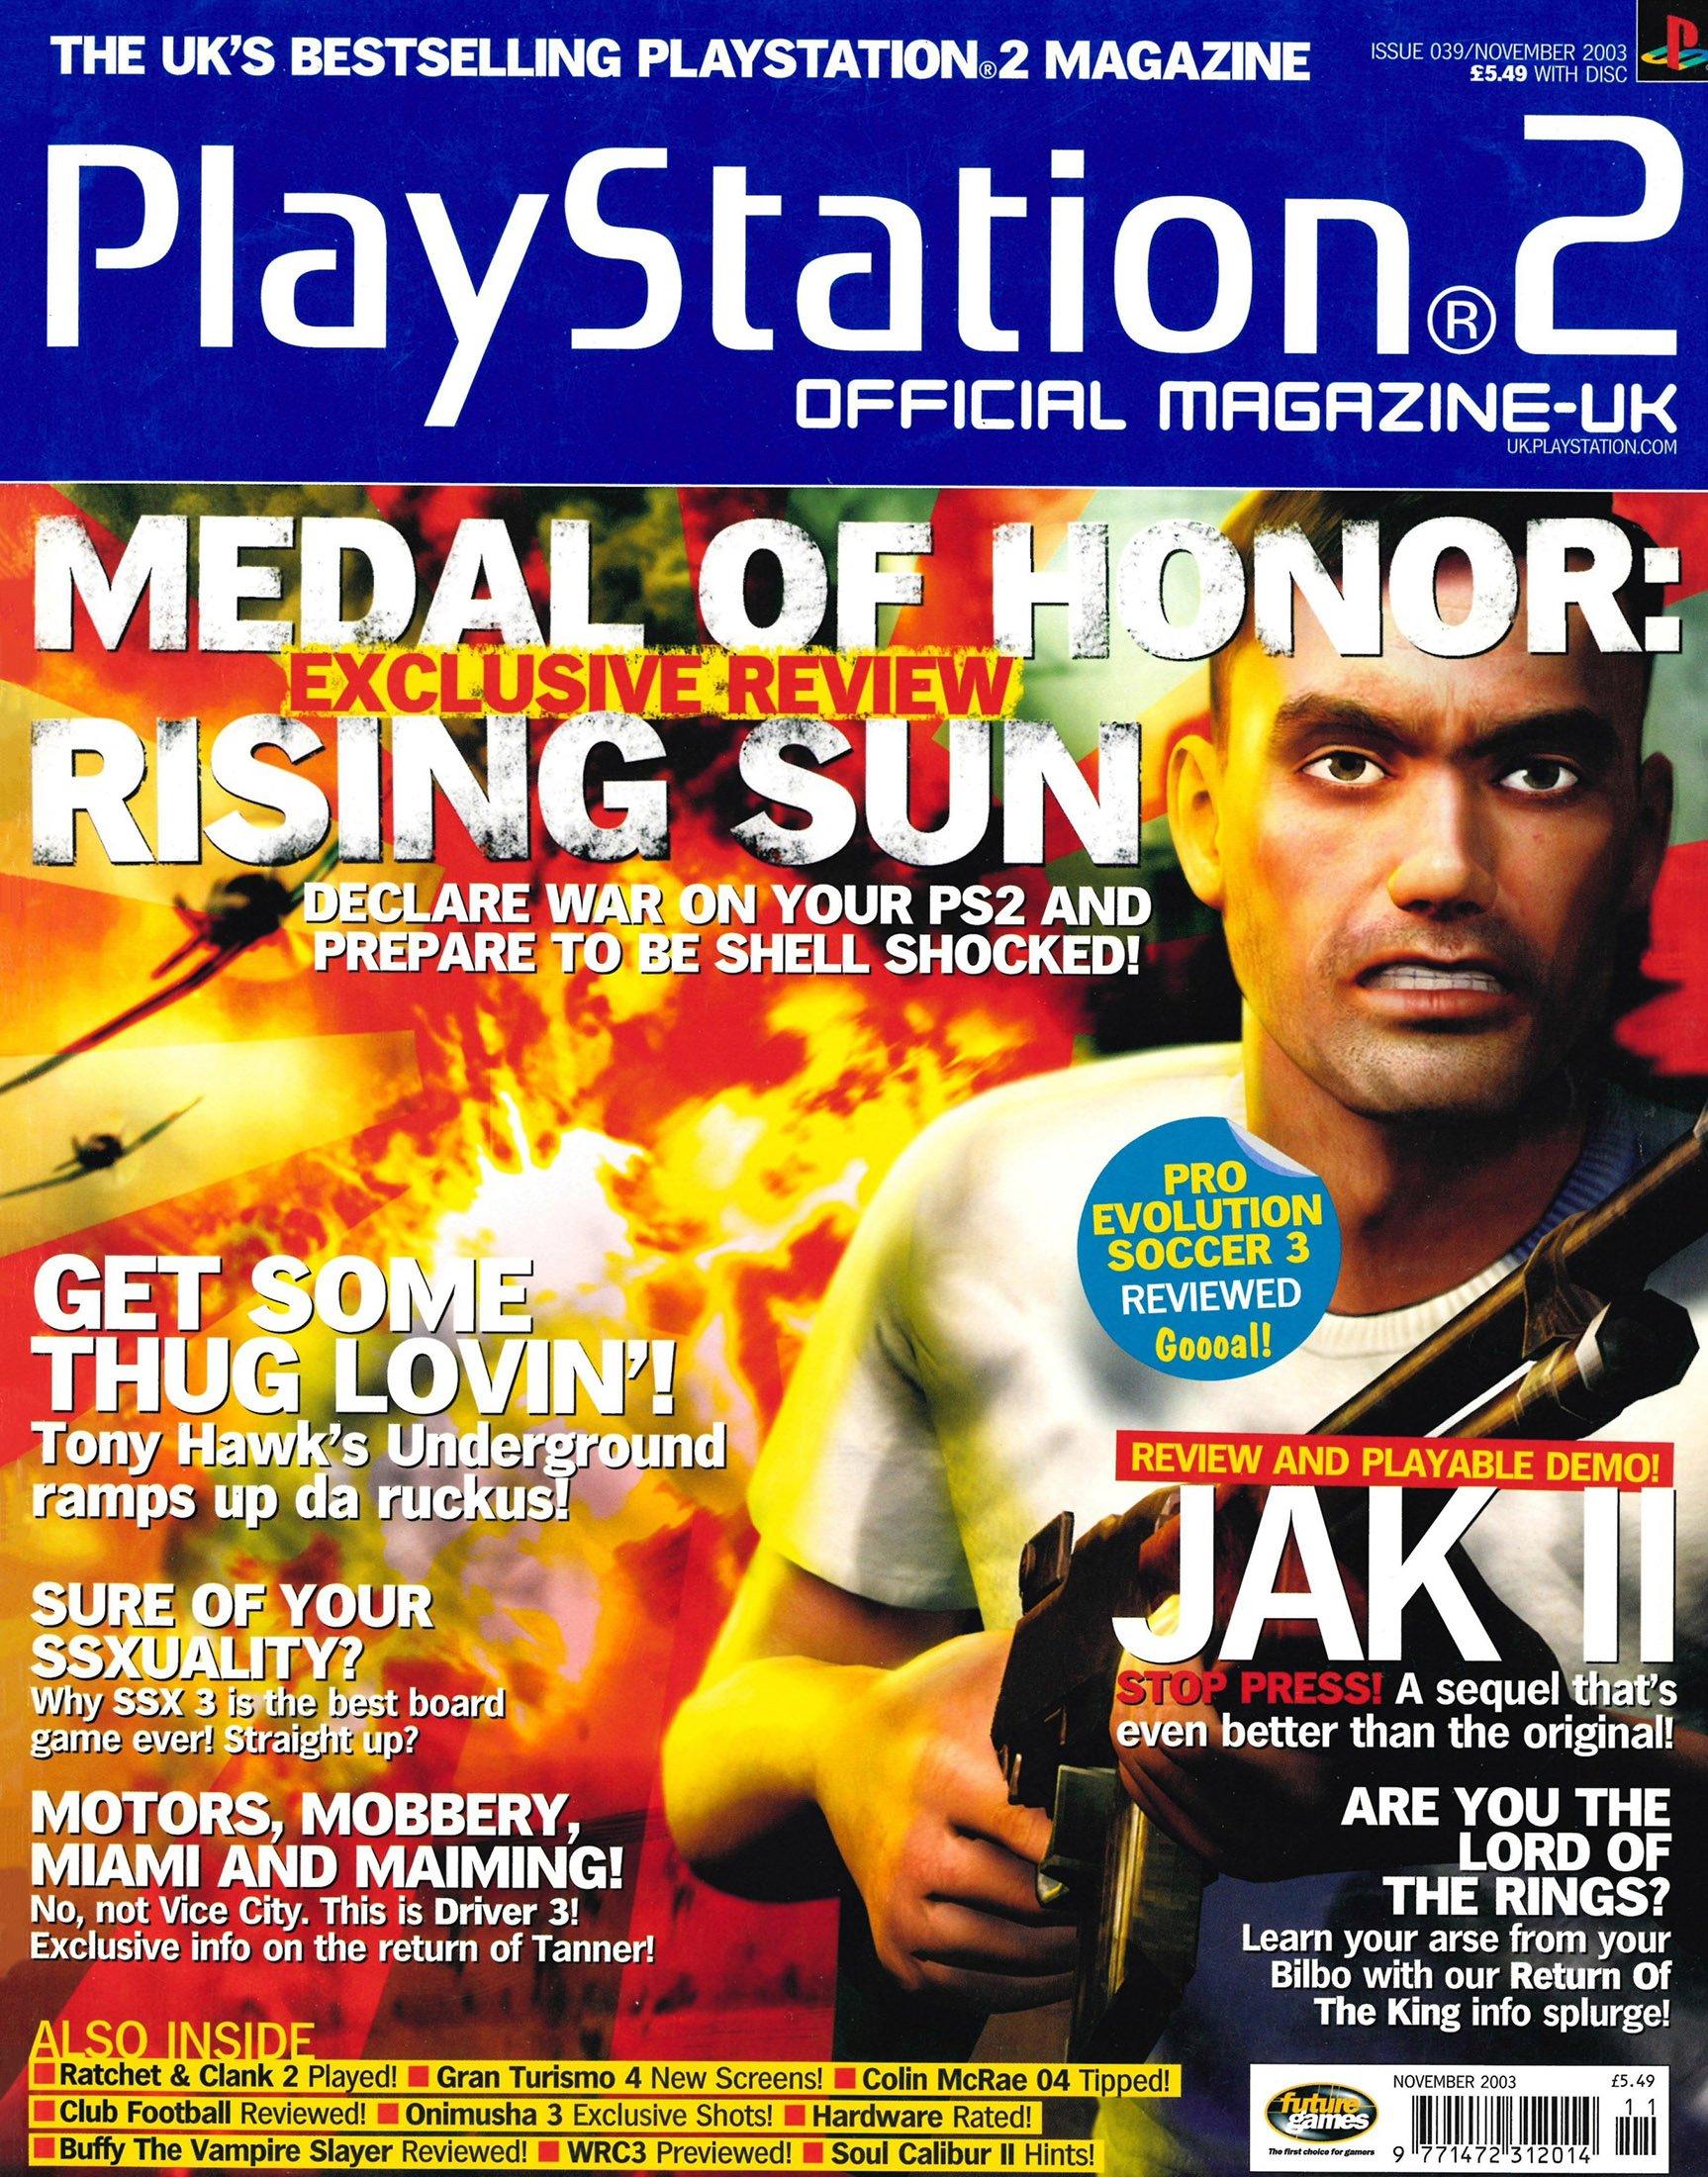 Official Playstation 2 Magazine UK 039 (November 2003)